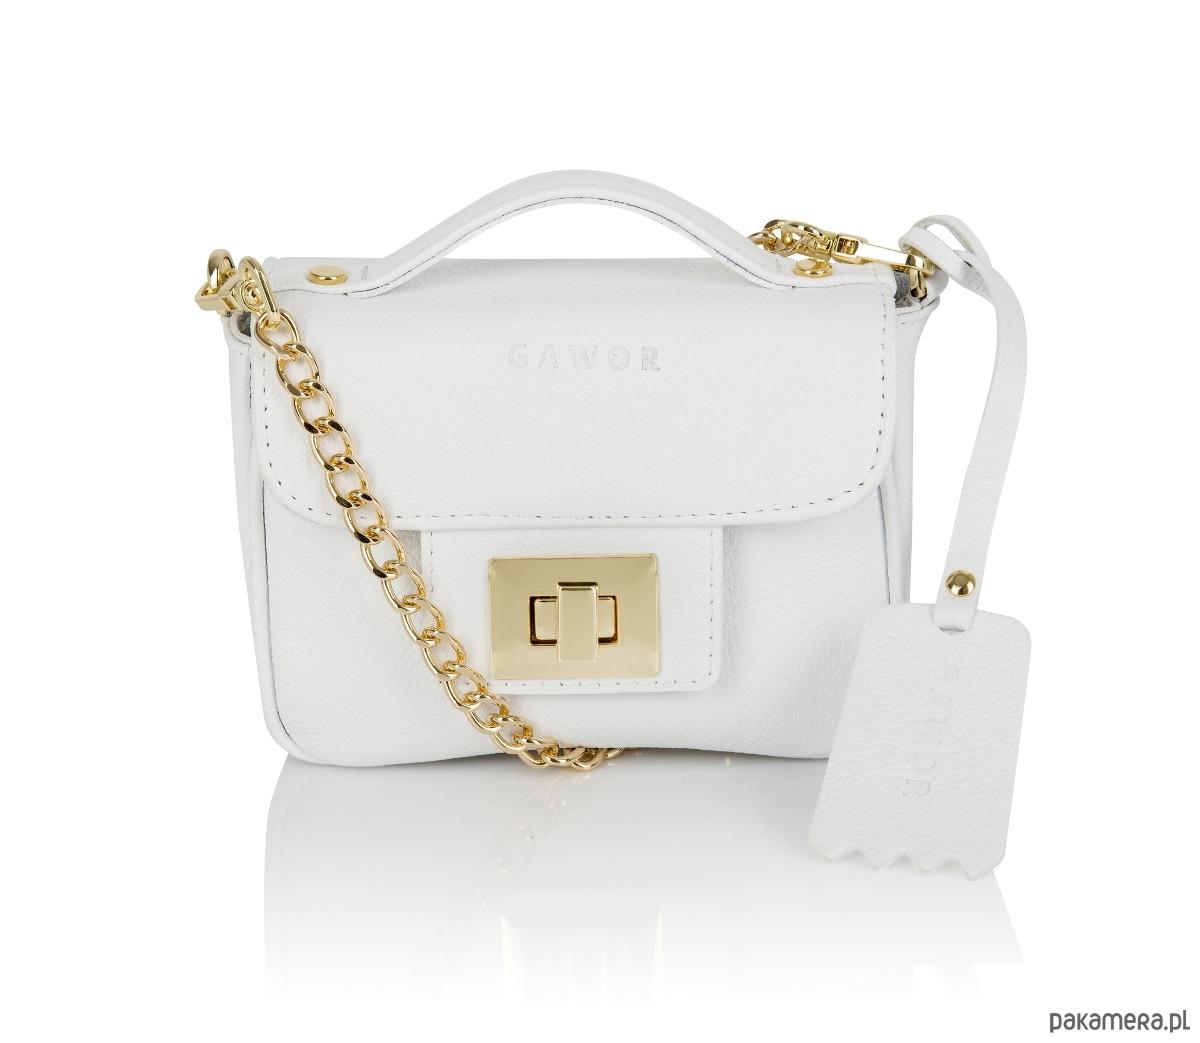 c1f806e19df3e Skórzana torebka kuferek biała złote dodatki - torebki mini ...